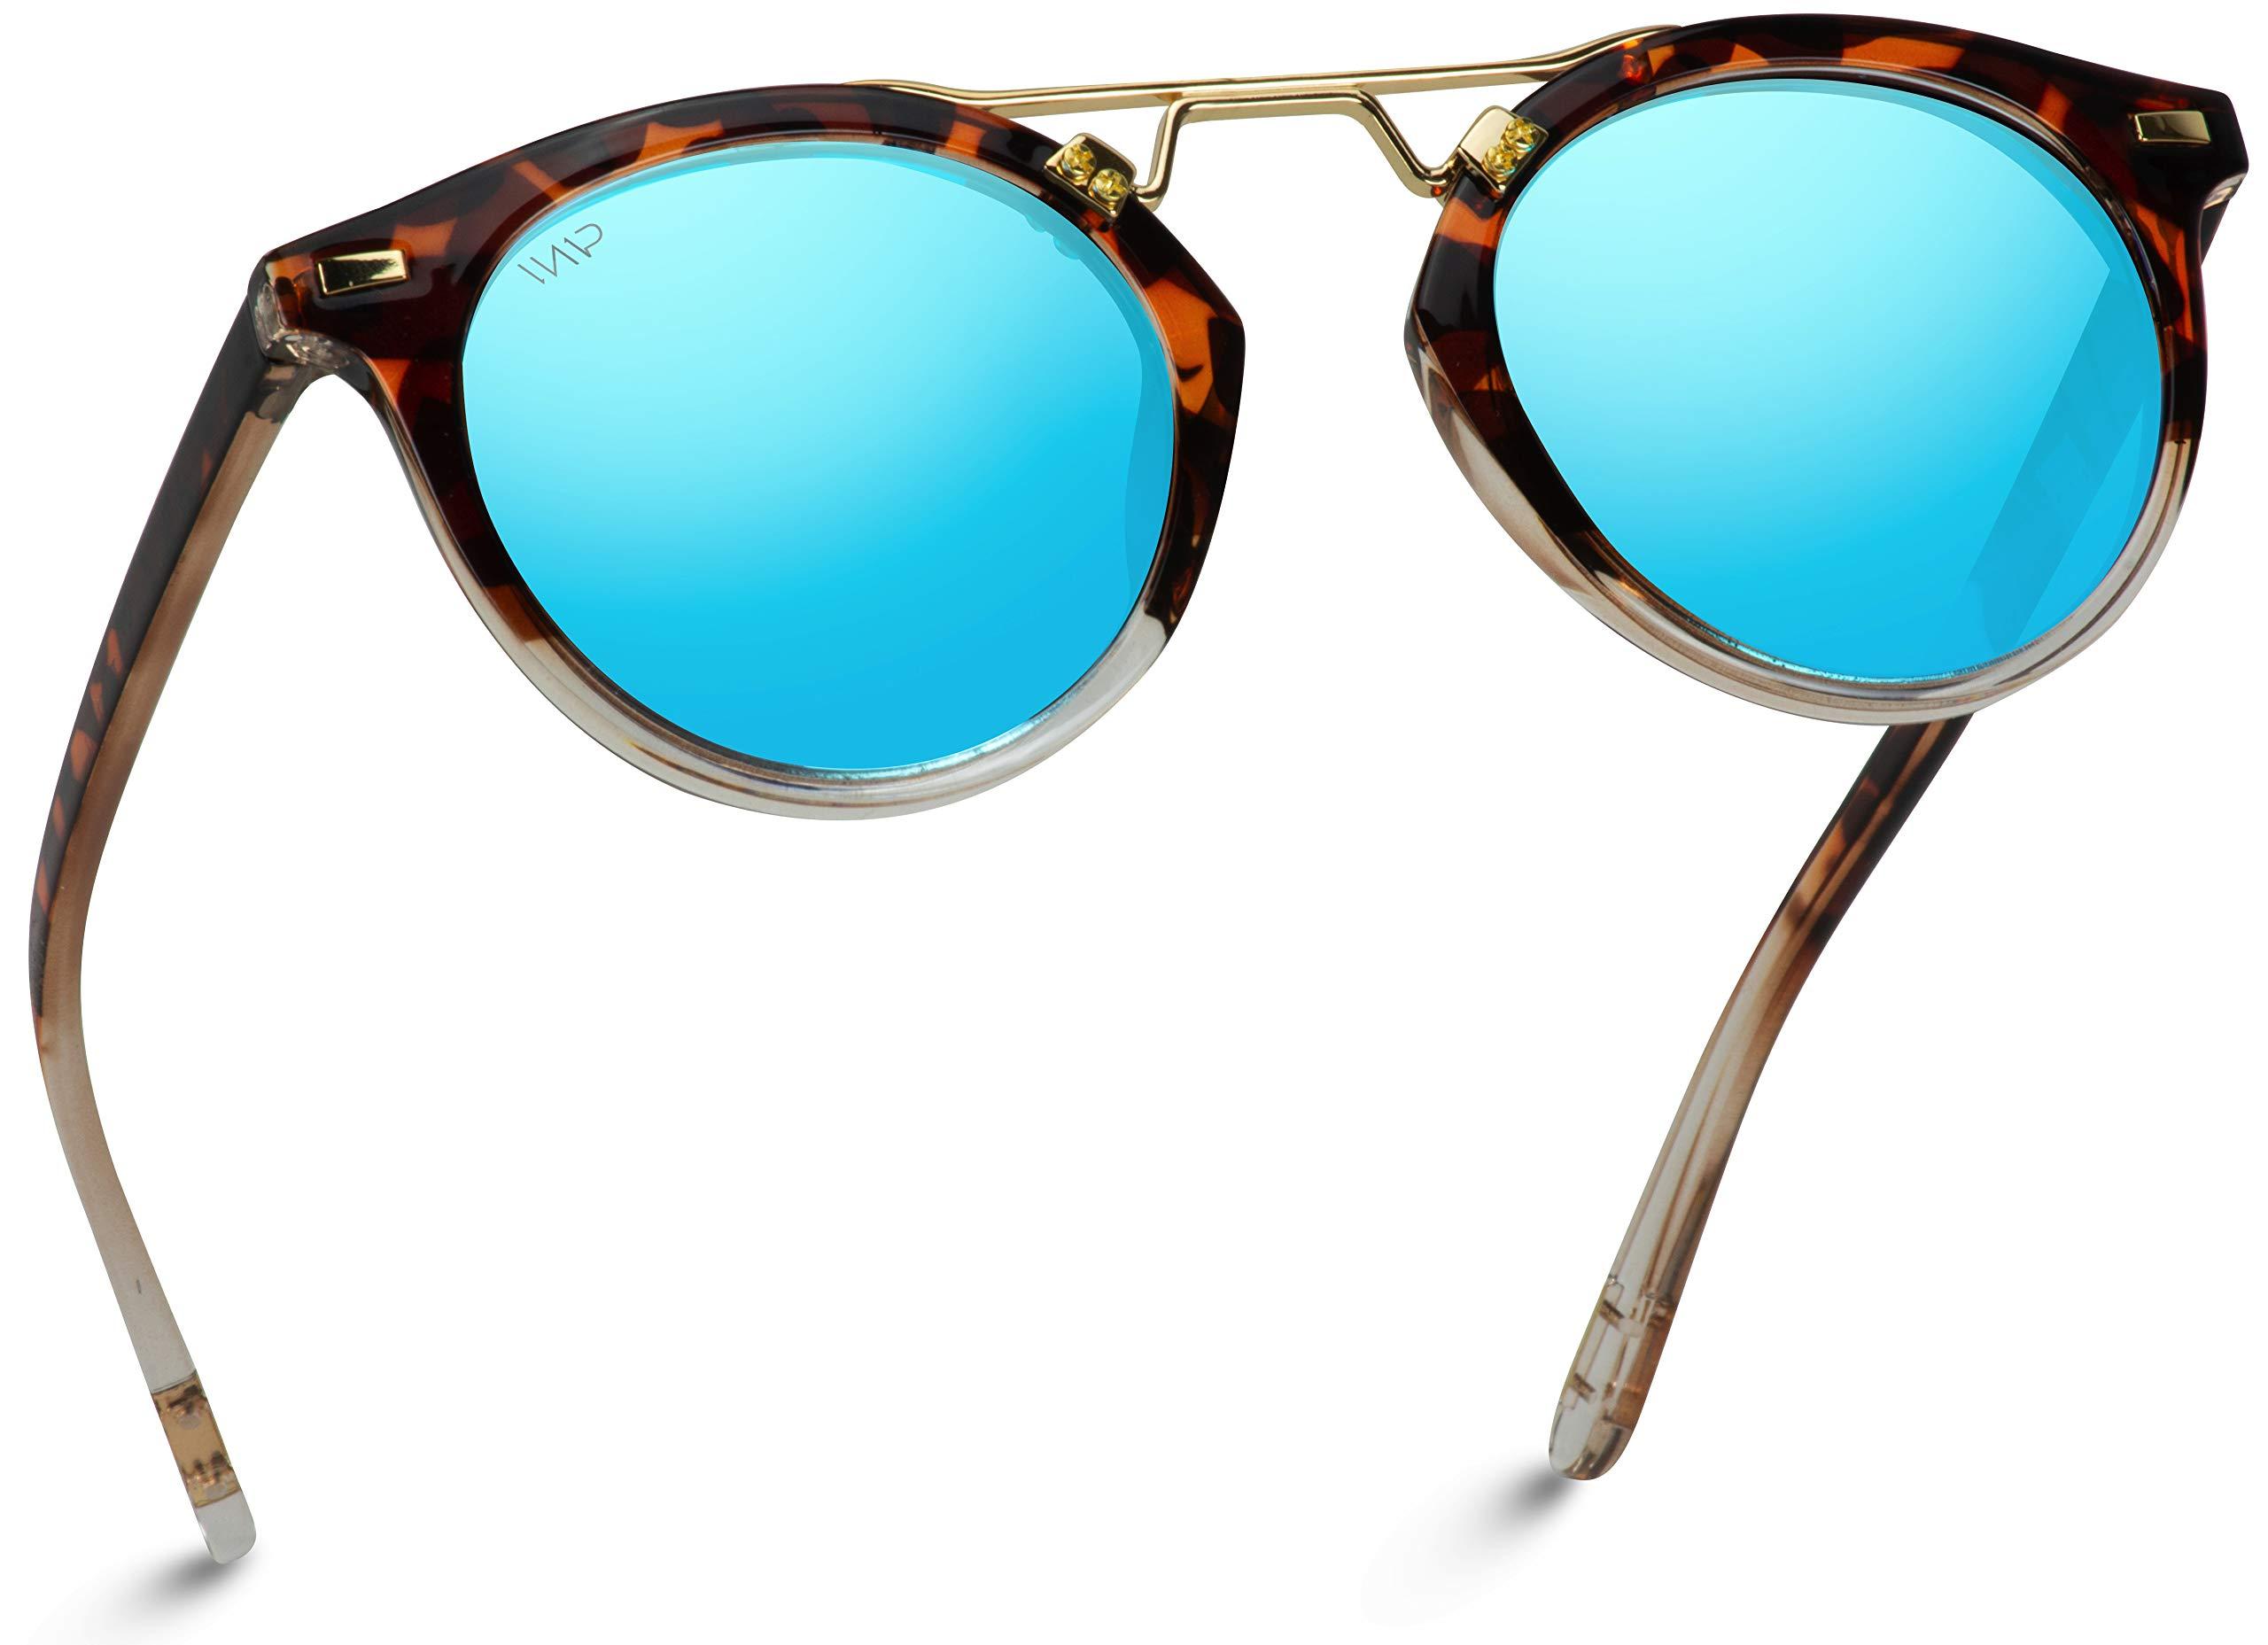 WearMe Pro - Polarized Round Vintage Retro Mirrored Lens Women Metal Frame Sunglasses by WearMe Pro